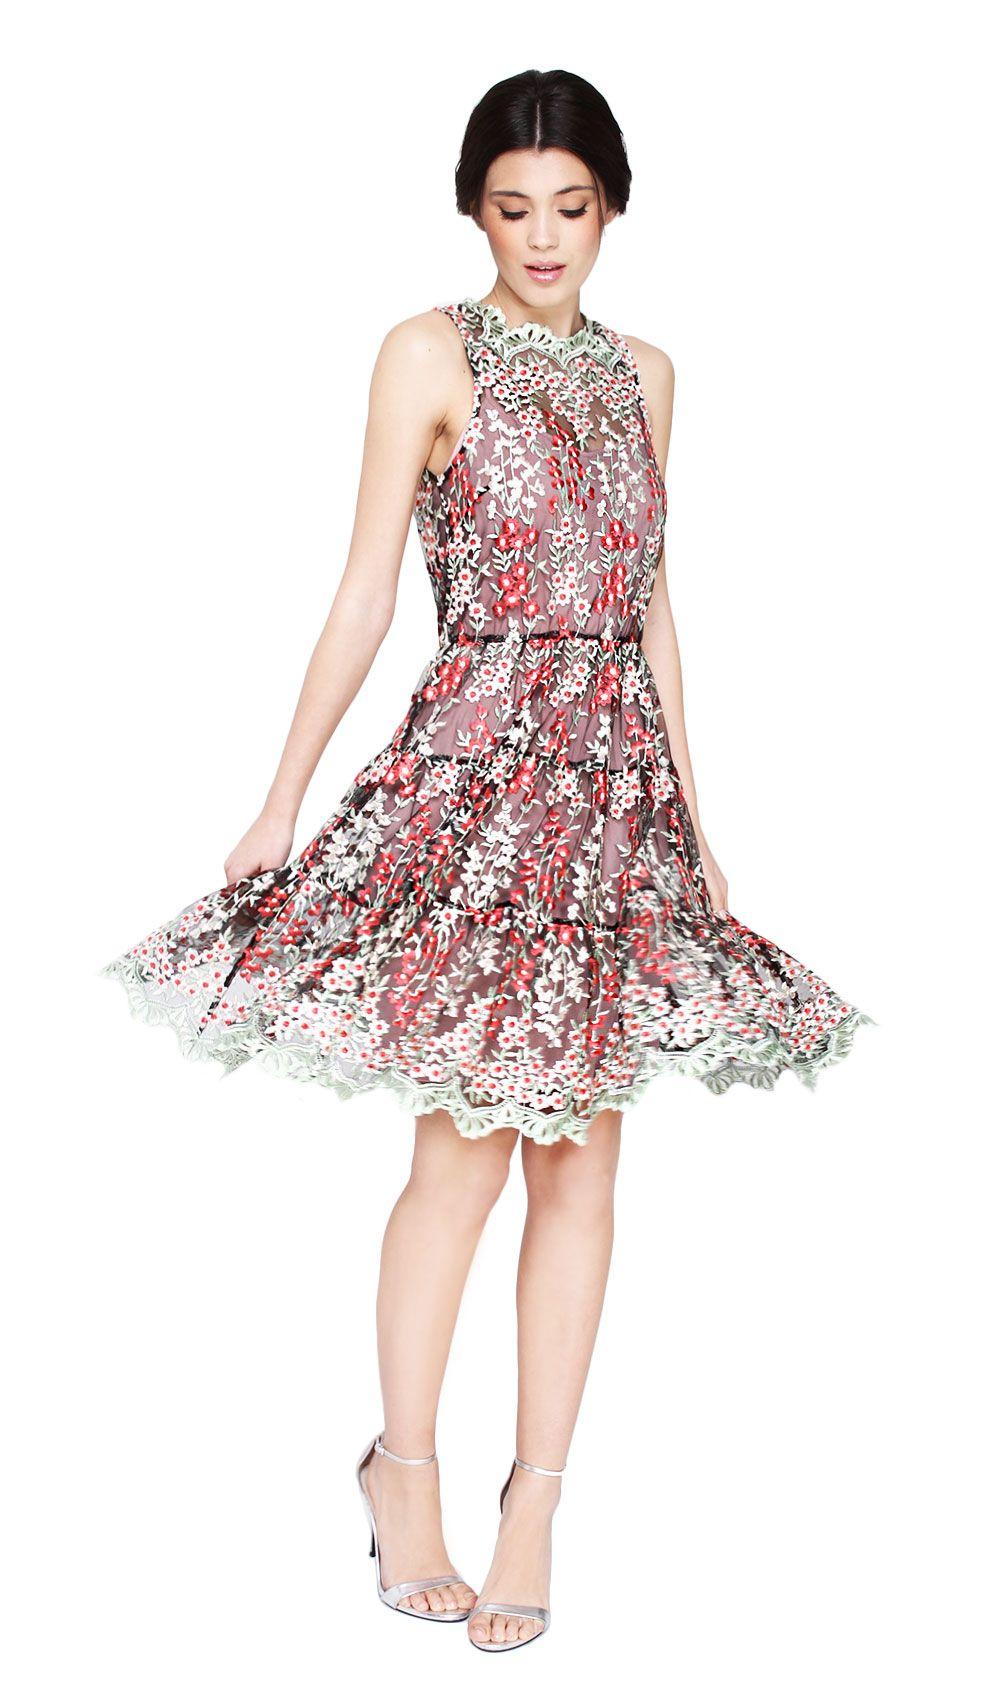 Erin Fetherston Bouquet Embroidered Cocktail Dress Designer Dress